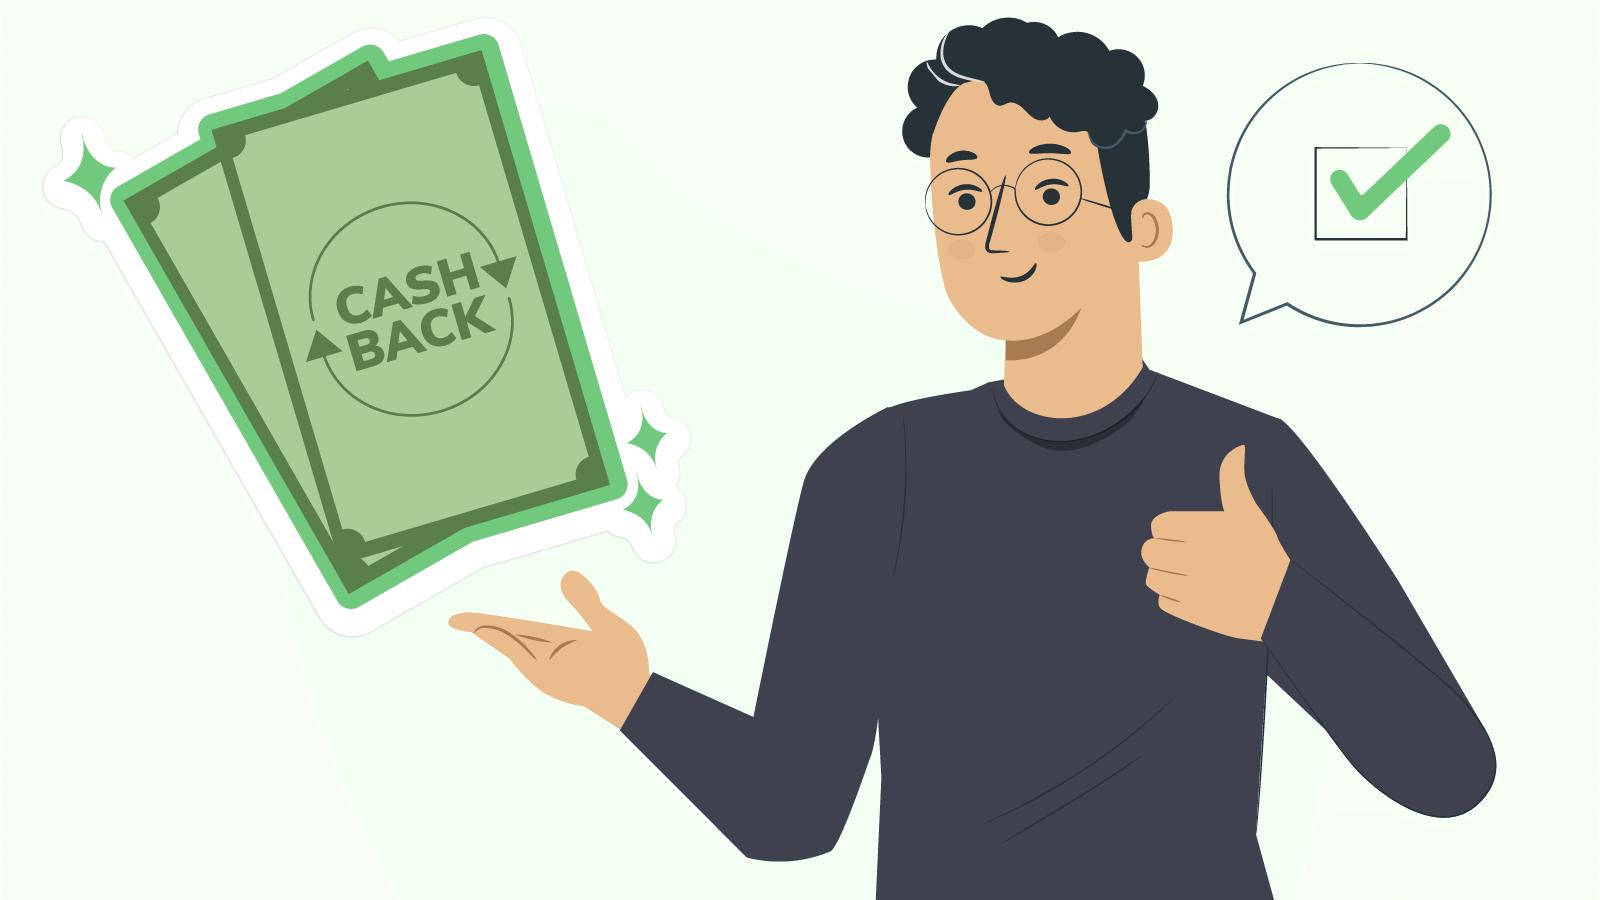 How to claim a cashback casino bonus in New Zealand